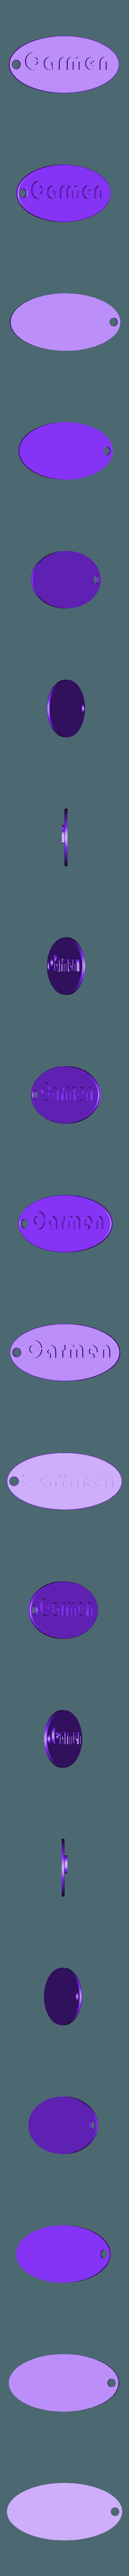 Simple_Keychain_Customizable_v1.stl Download free STL file Simple Keychain Customizable • 3D print model, PilotDog